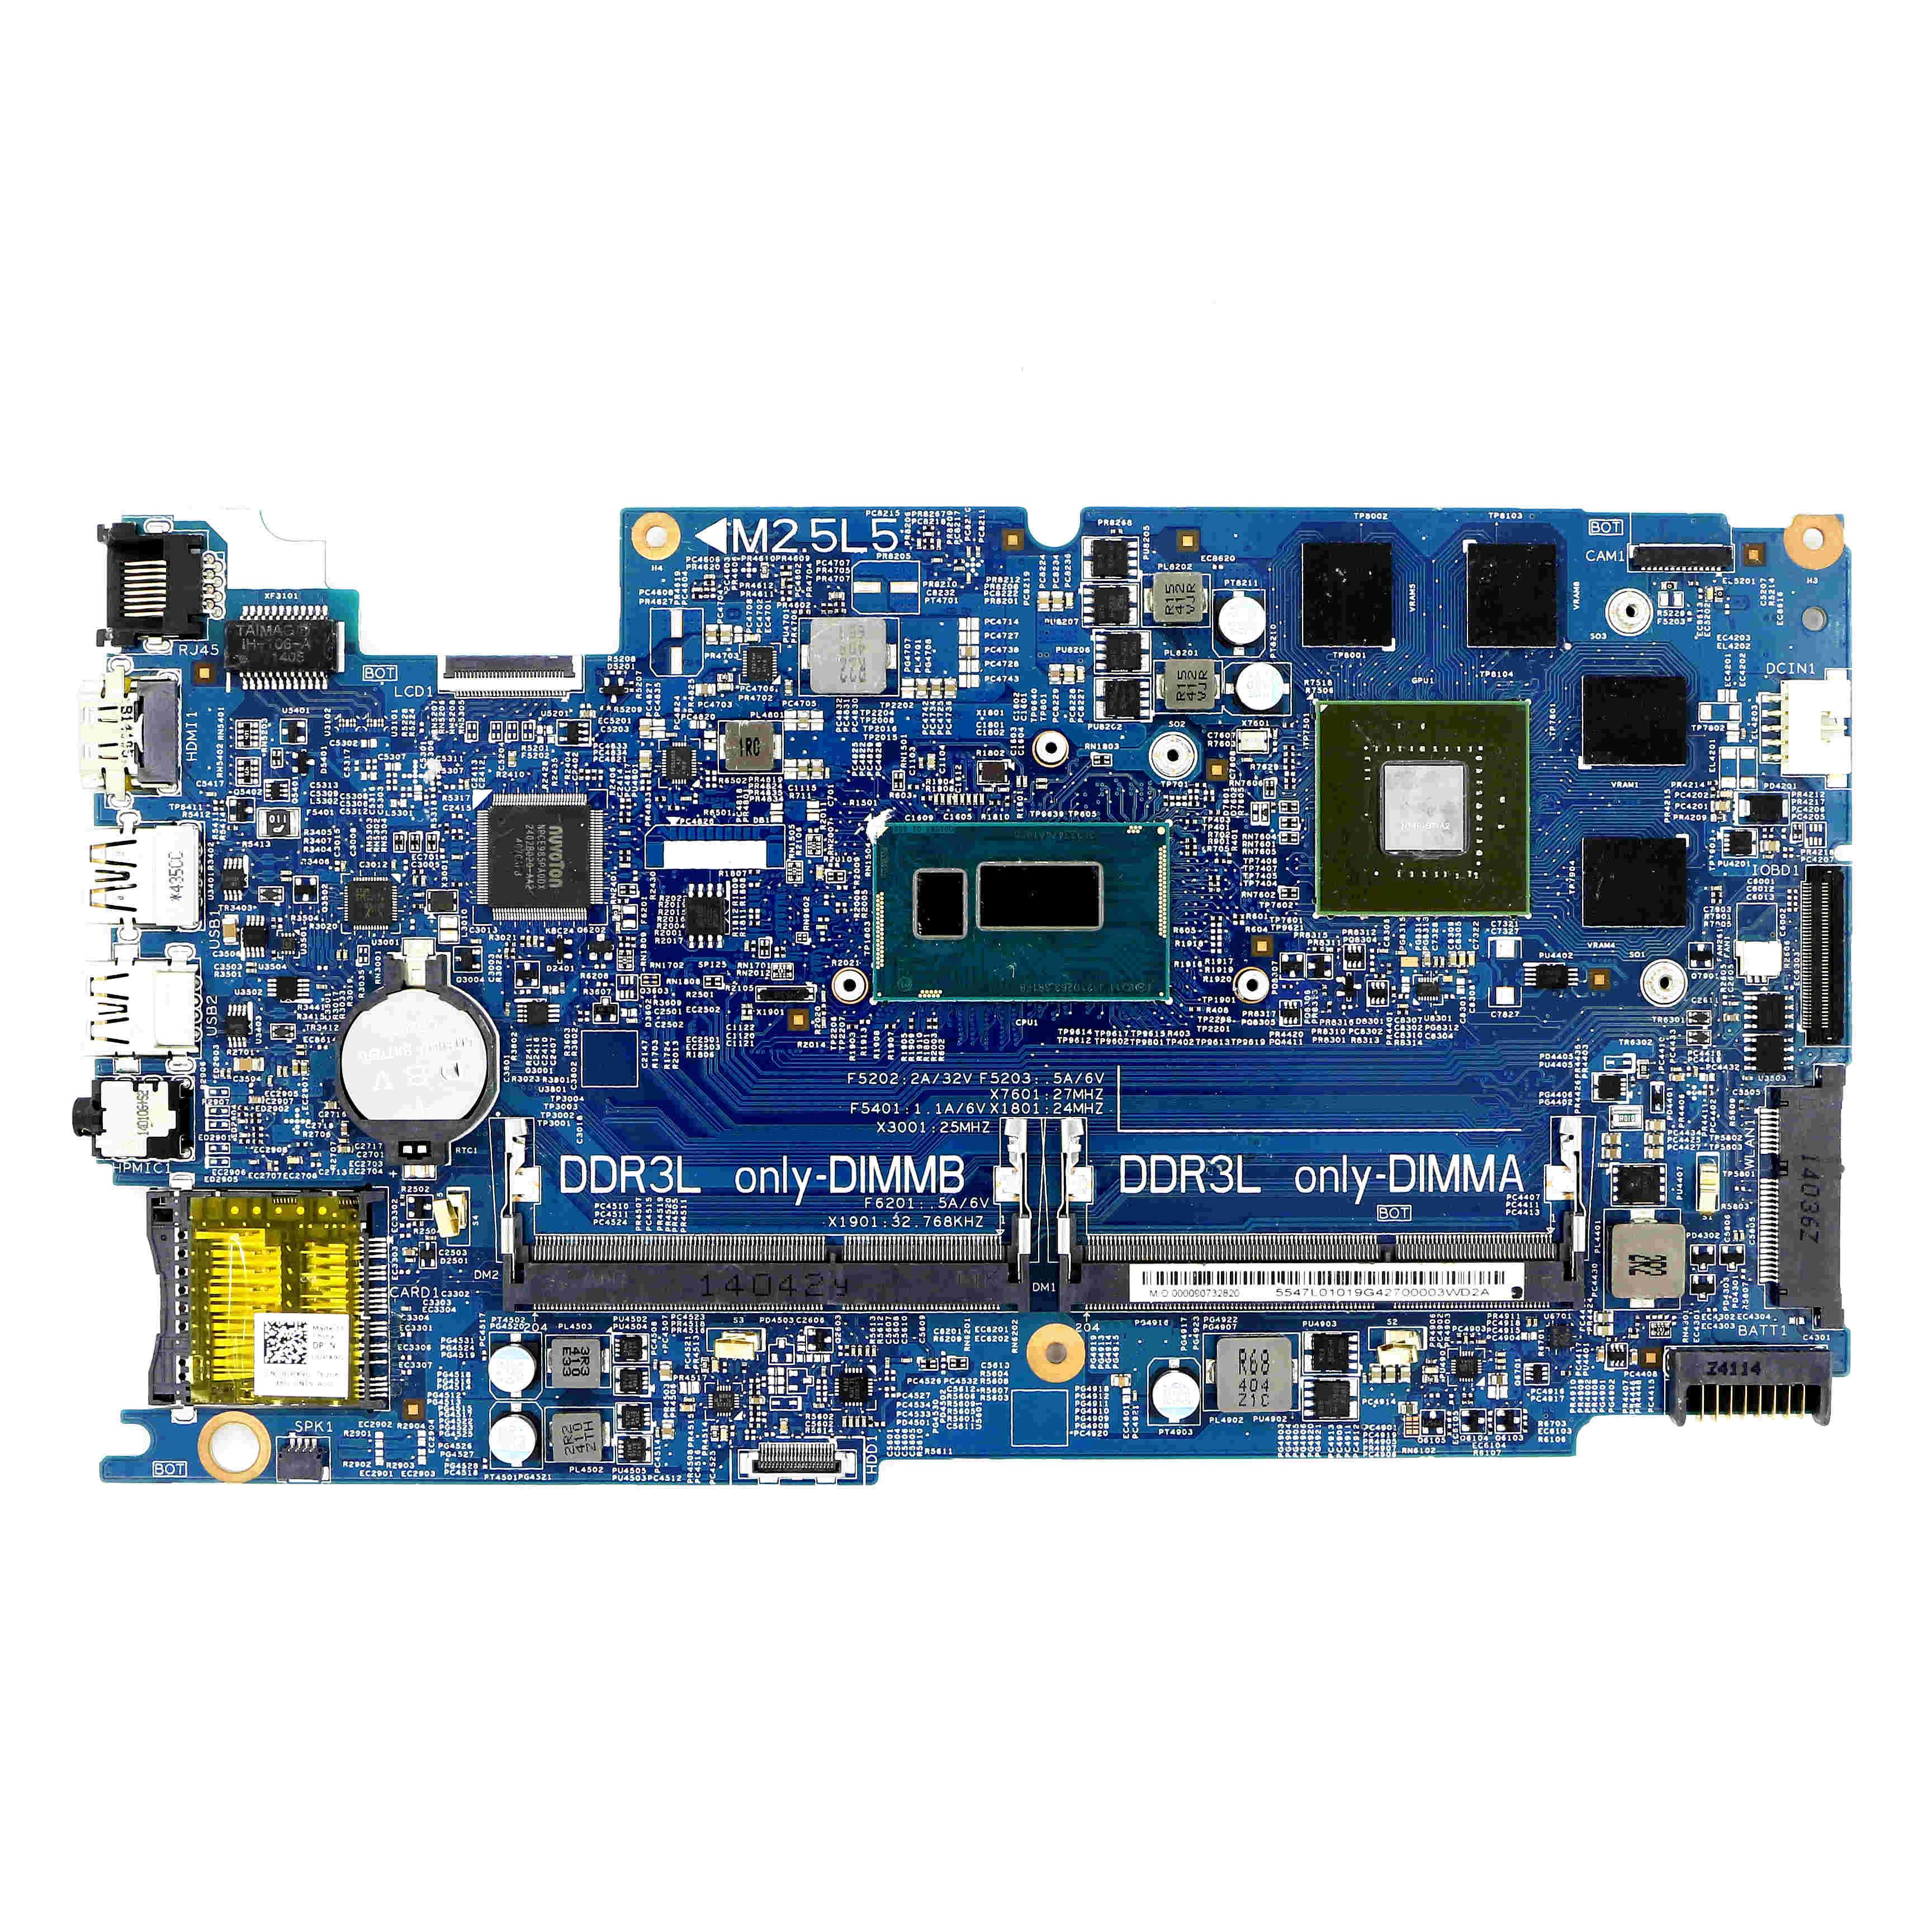 DPX9G - DSC DDR3L płyta główna KJ7NX DOH50 12311-2 w/ i7-4510U 2.0GHz + GT 750M V2G do laptopów DELL Inspiron 15 (7537) FHD